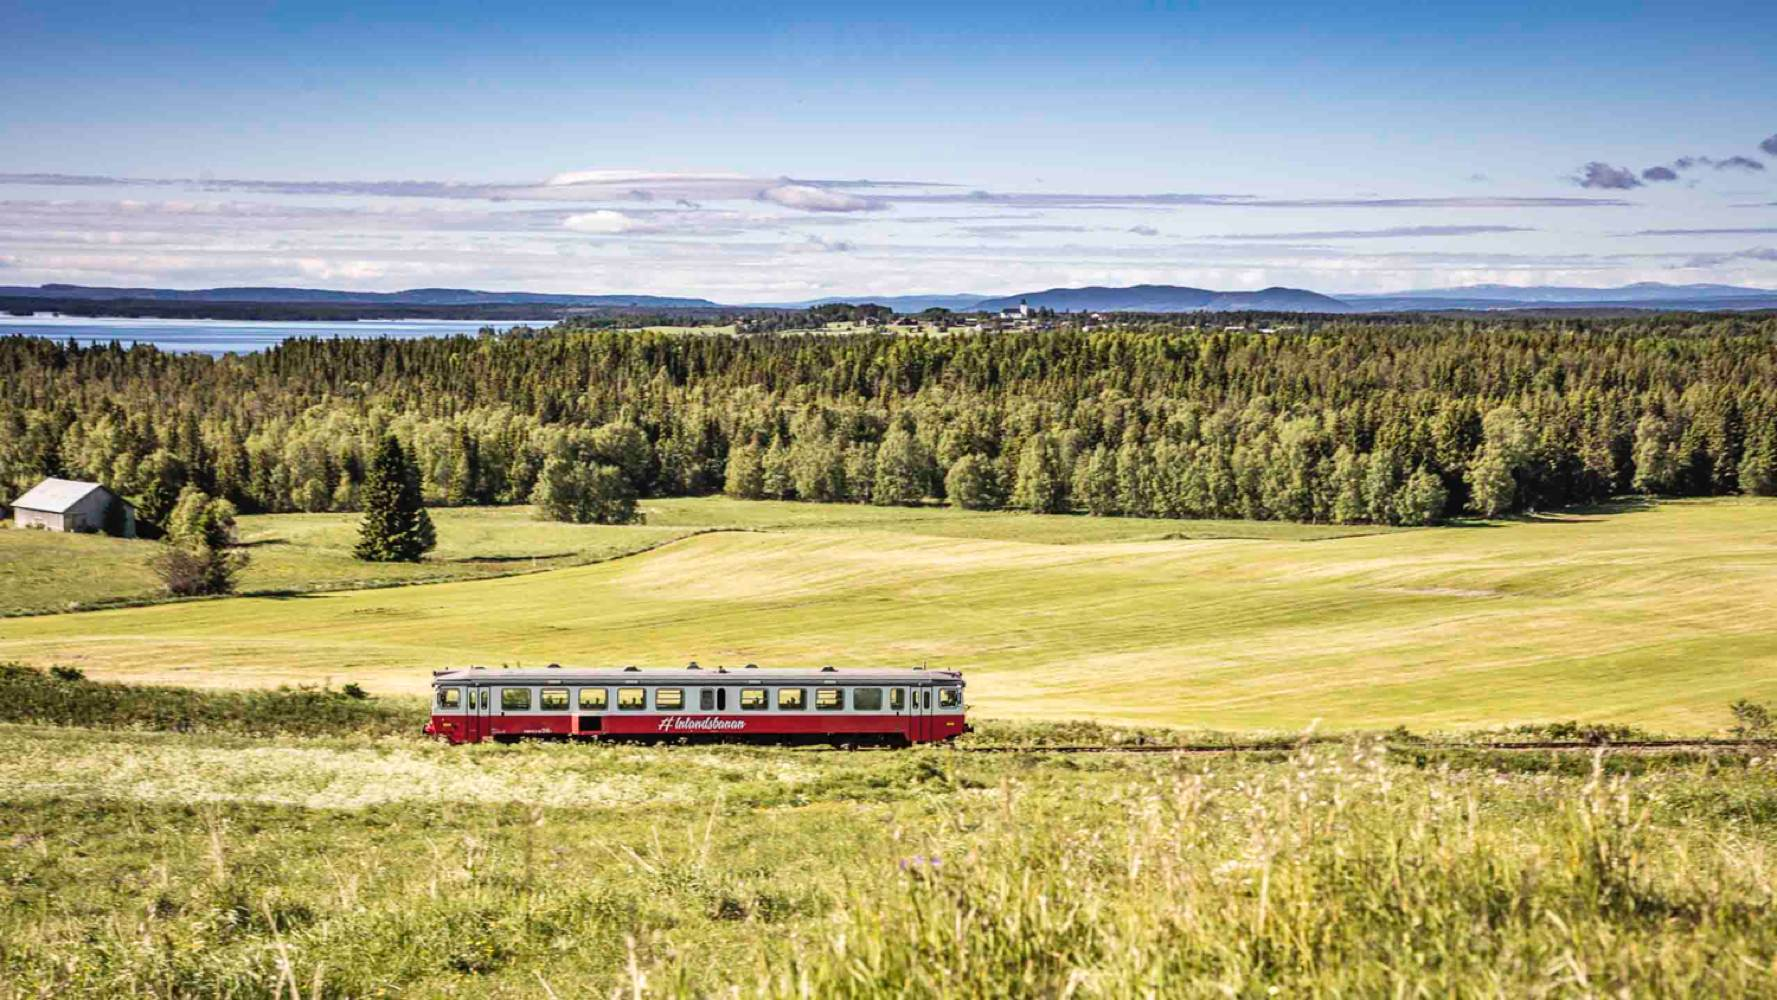 Inlandsbanan © inlandsbanan.se